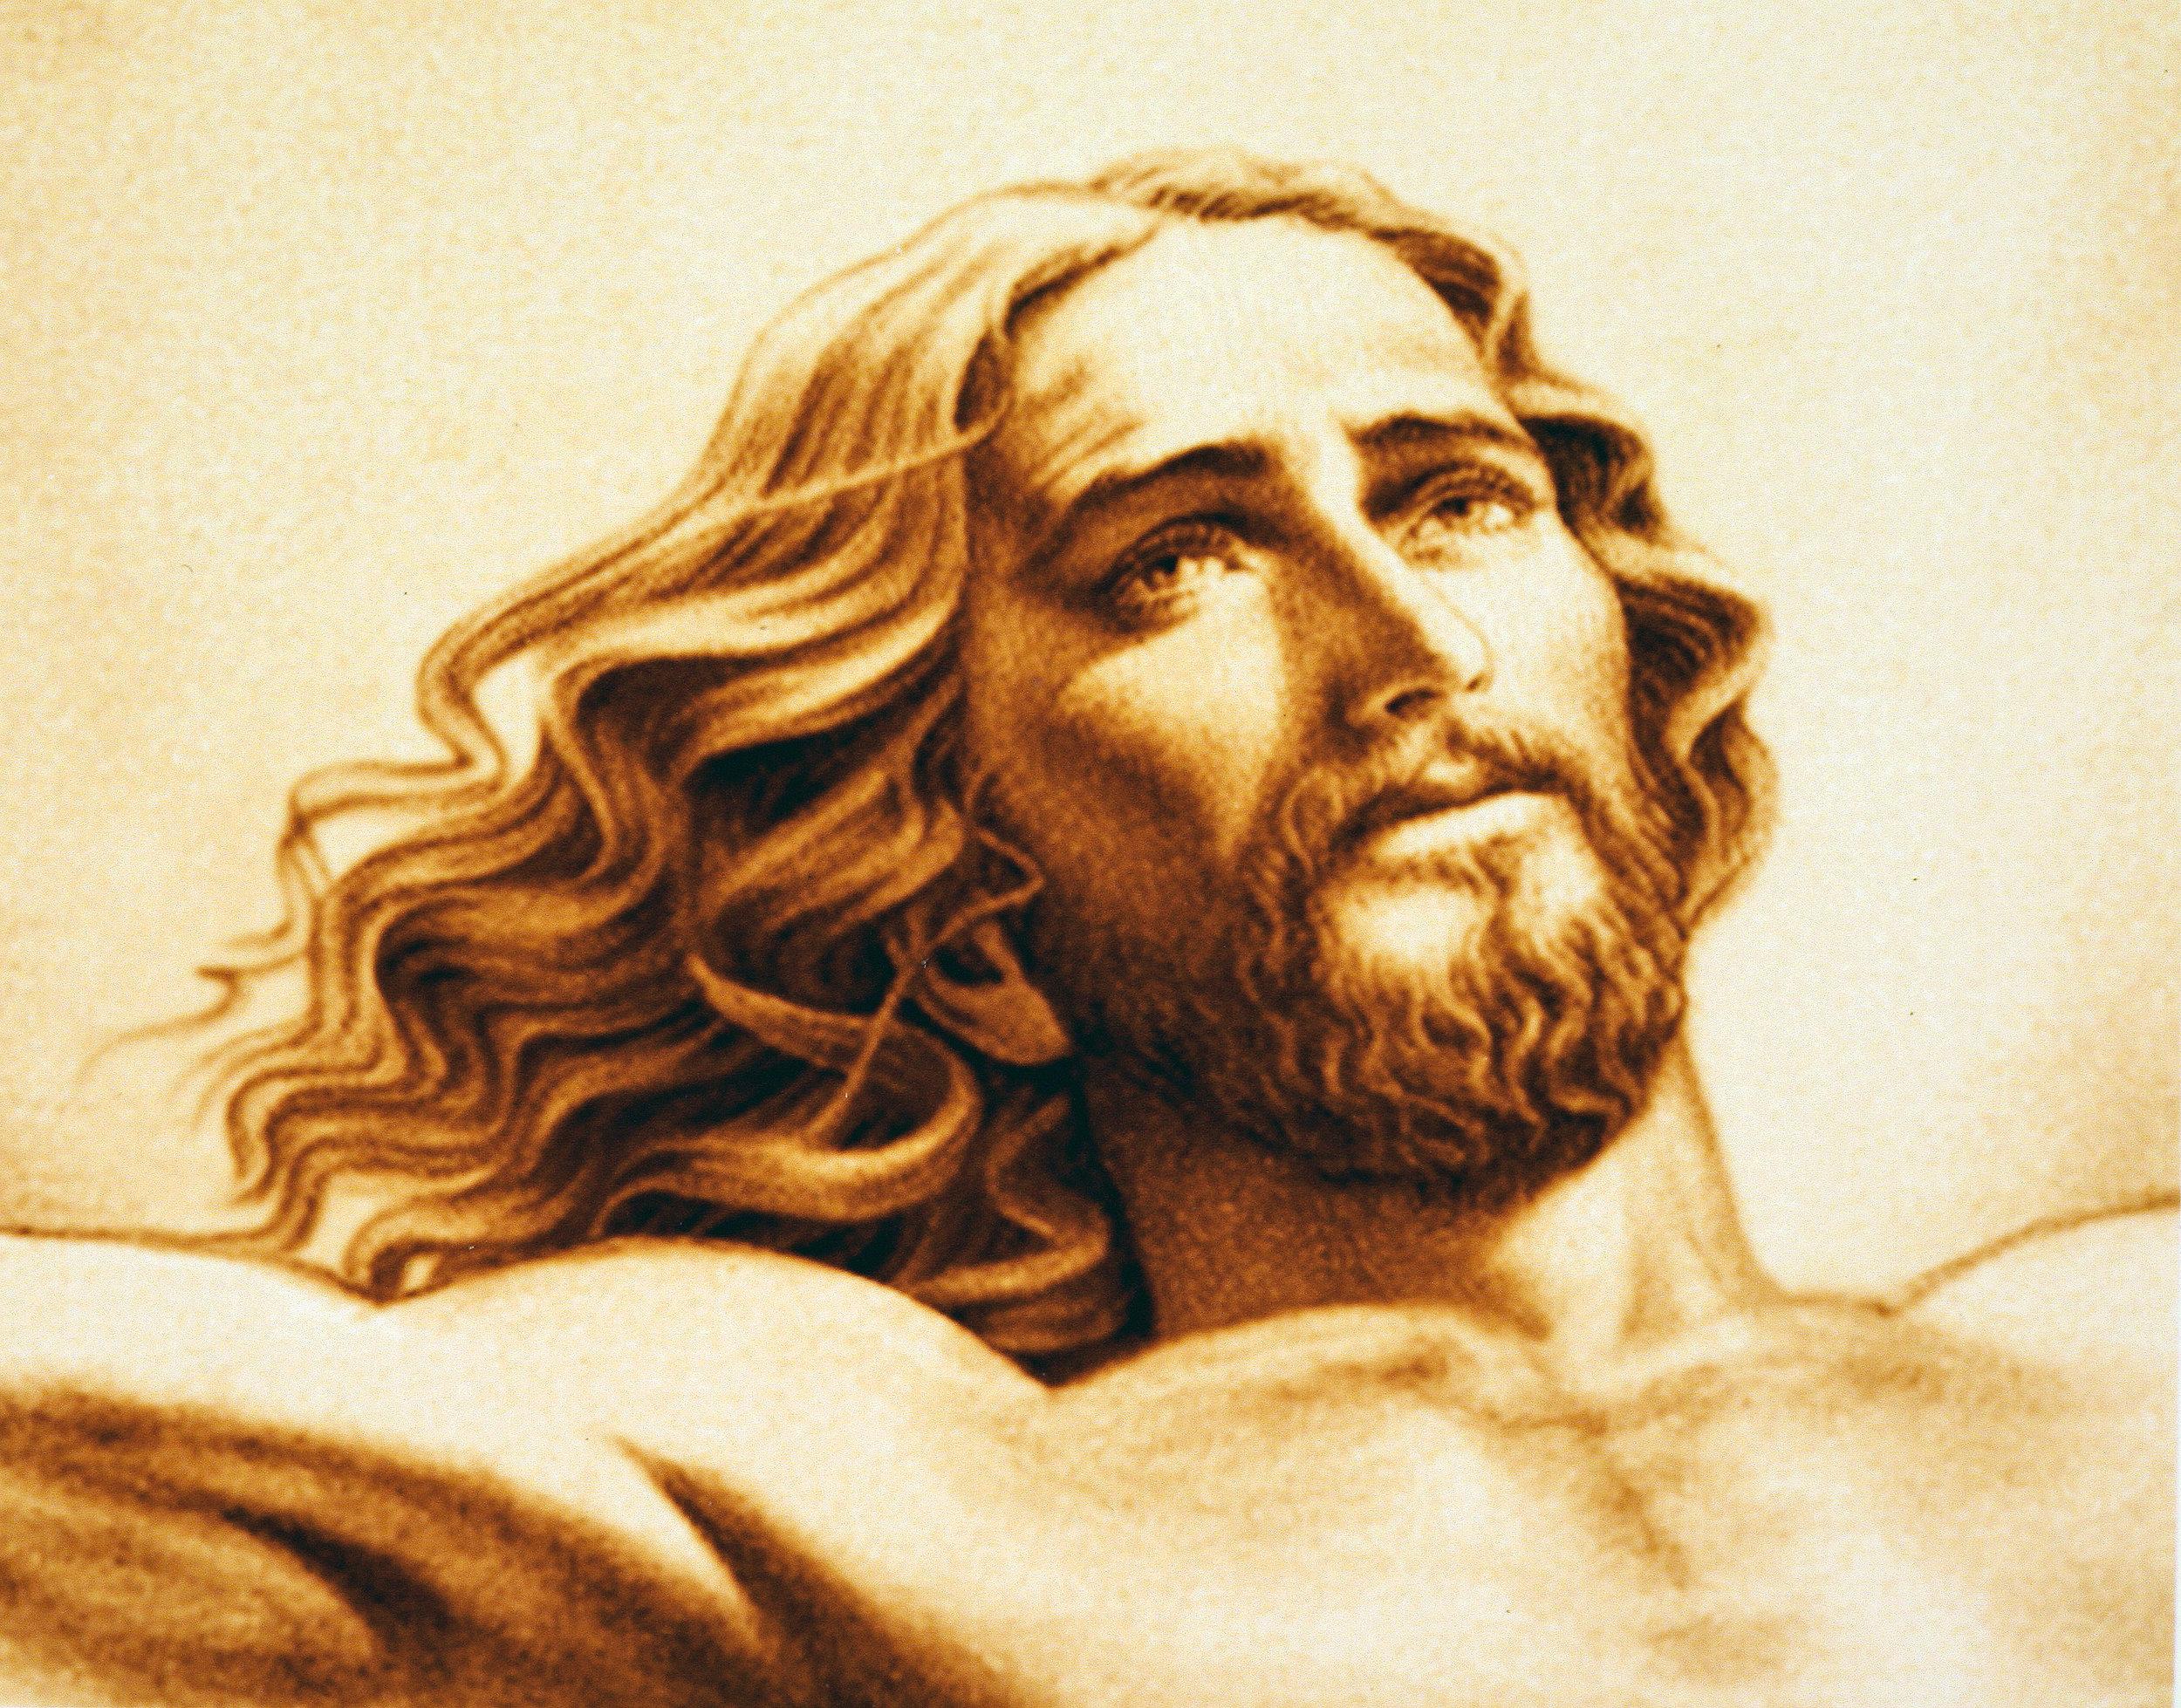 WilliamAlanShirley-Christ-painting-oil.jpg